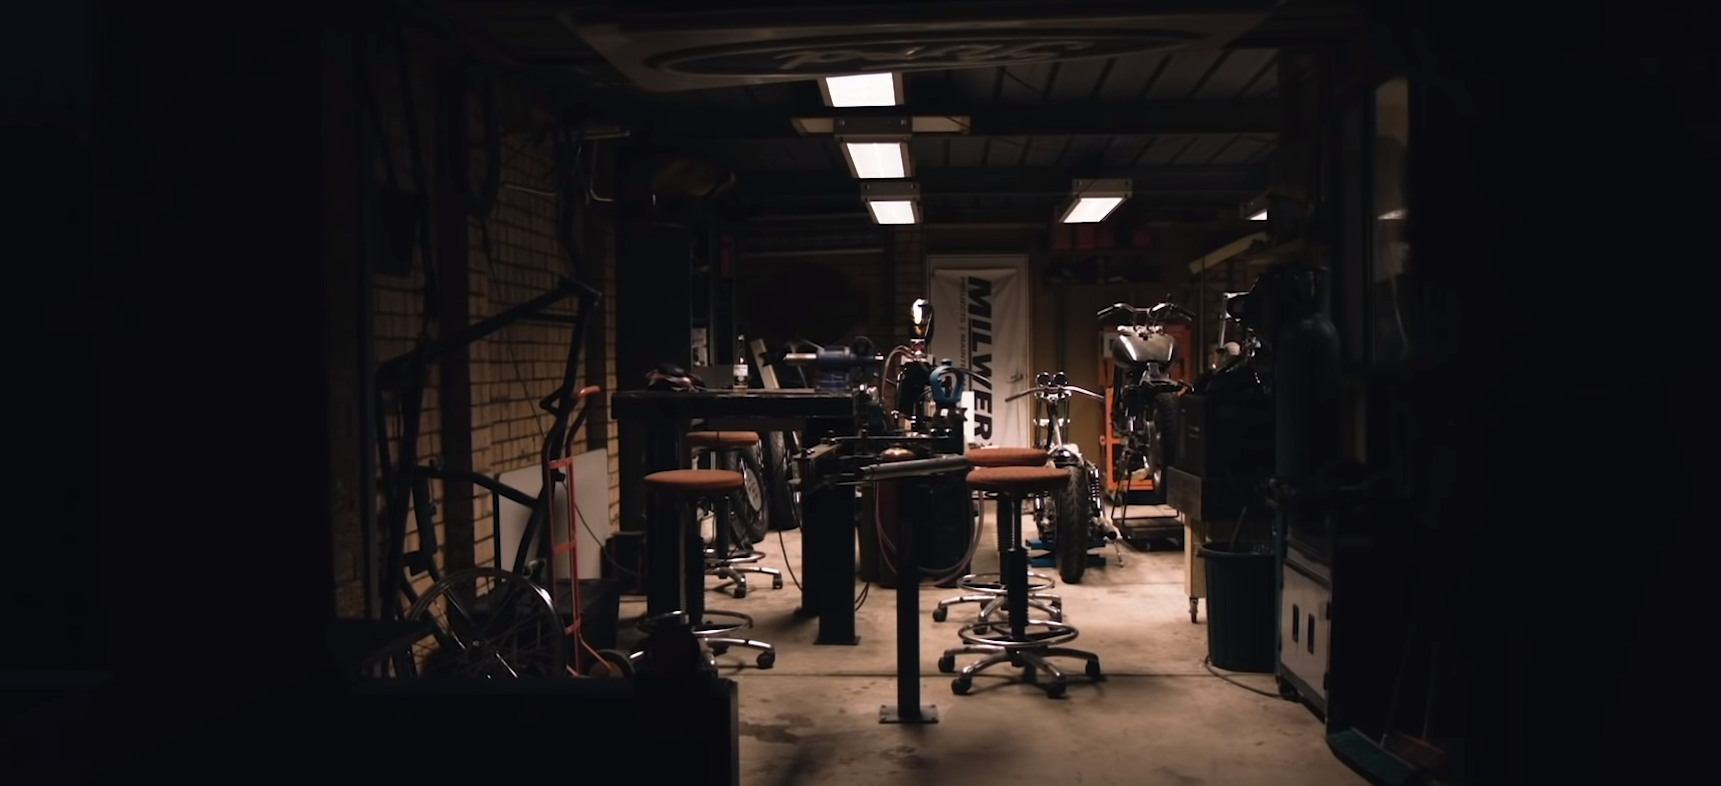 Brad miller motorcycle film documentary